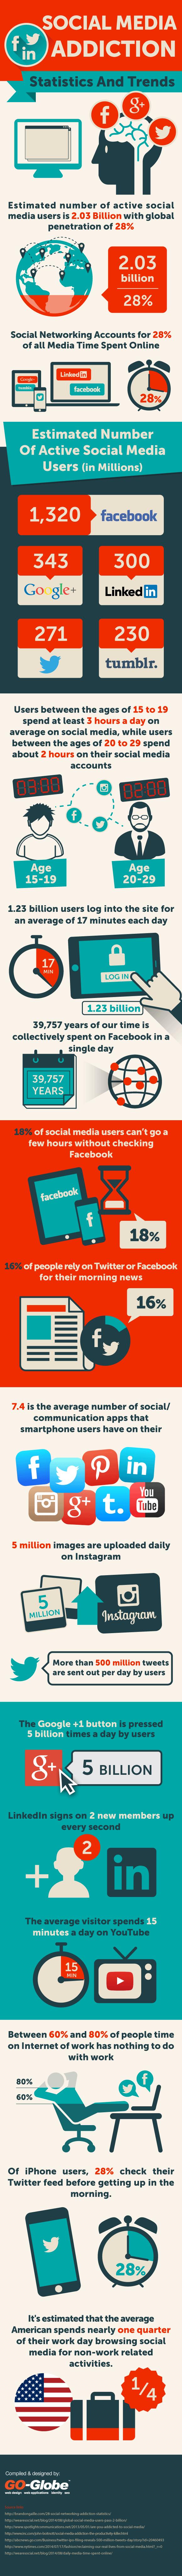 social-media-addiction-statistics-and-trends_549e852a817bf